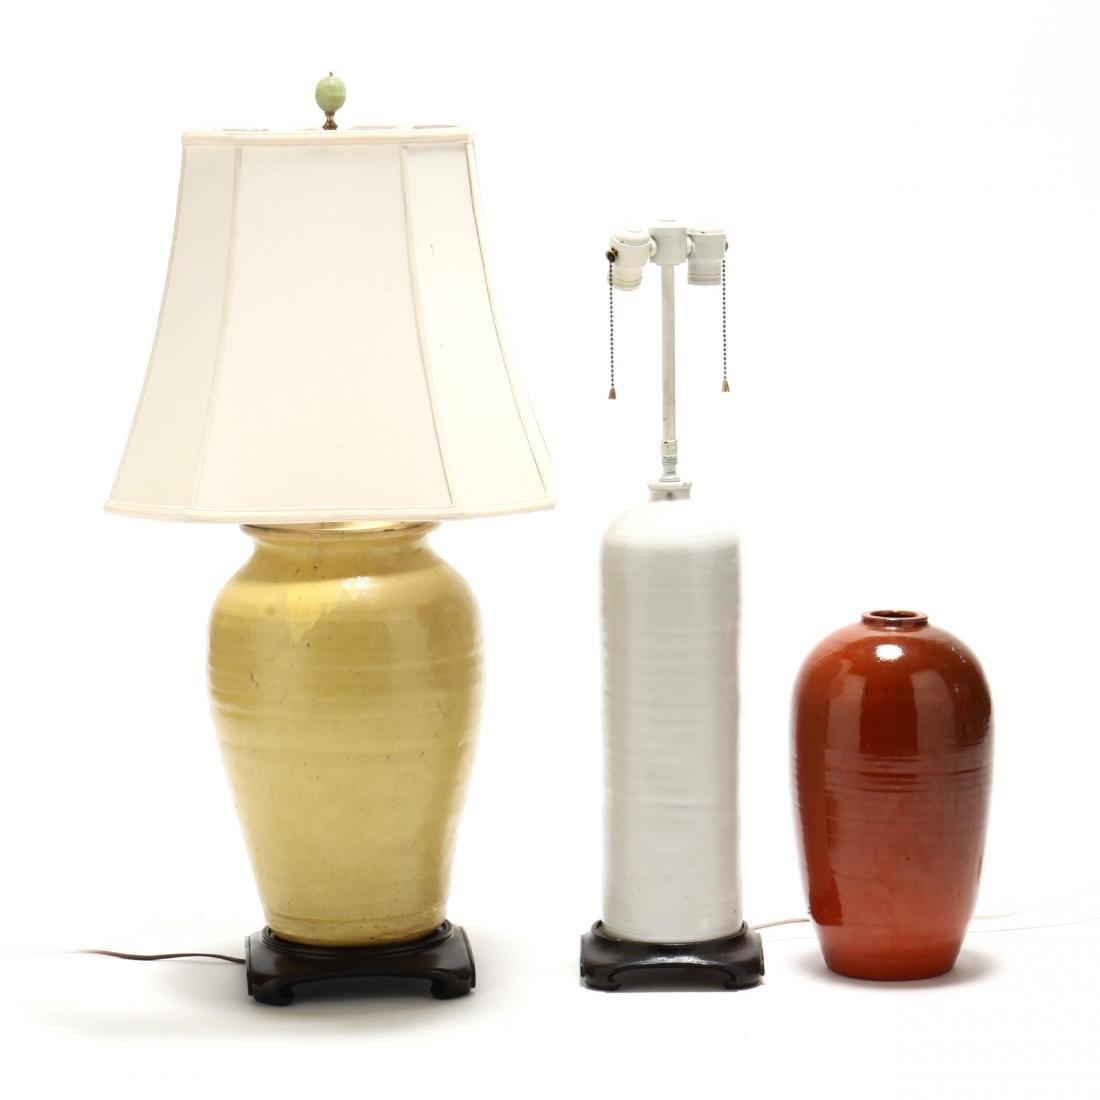 Three Pottery Lamp Bases